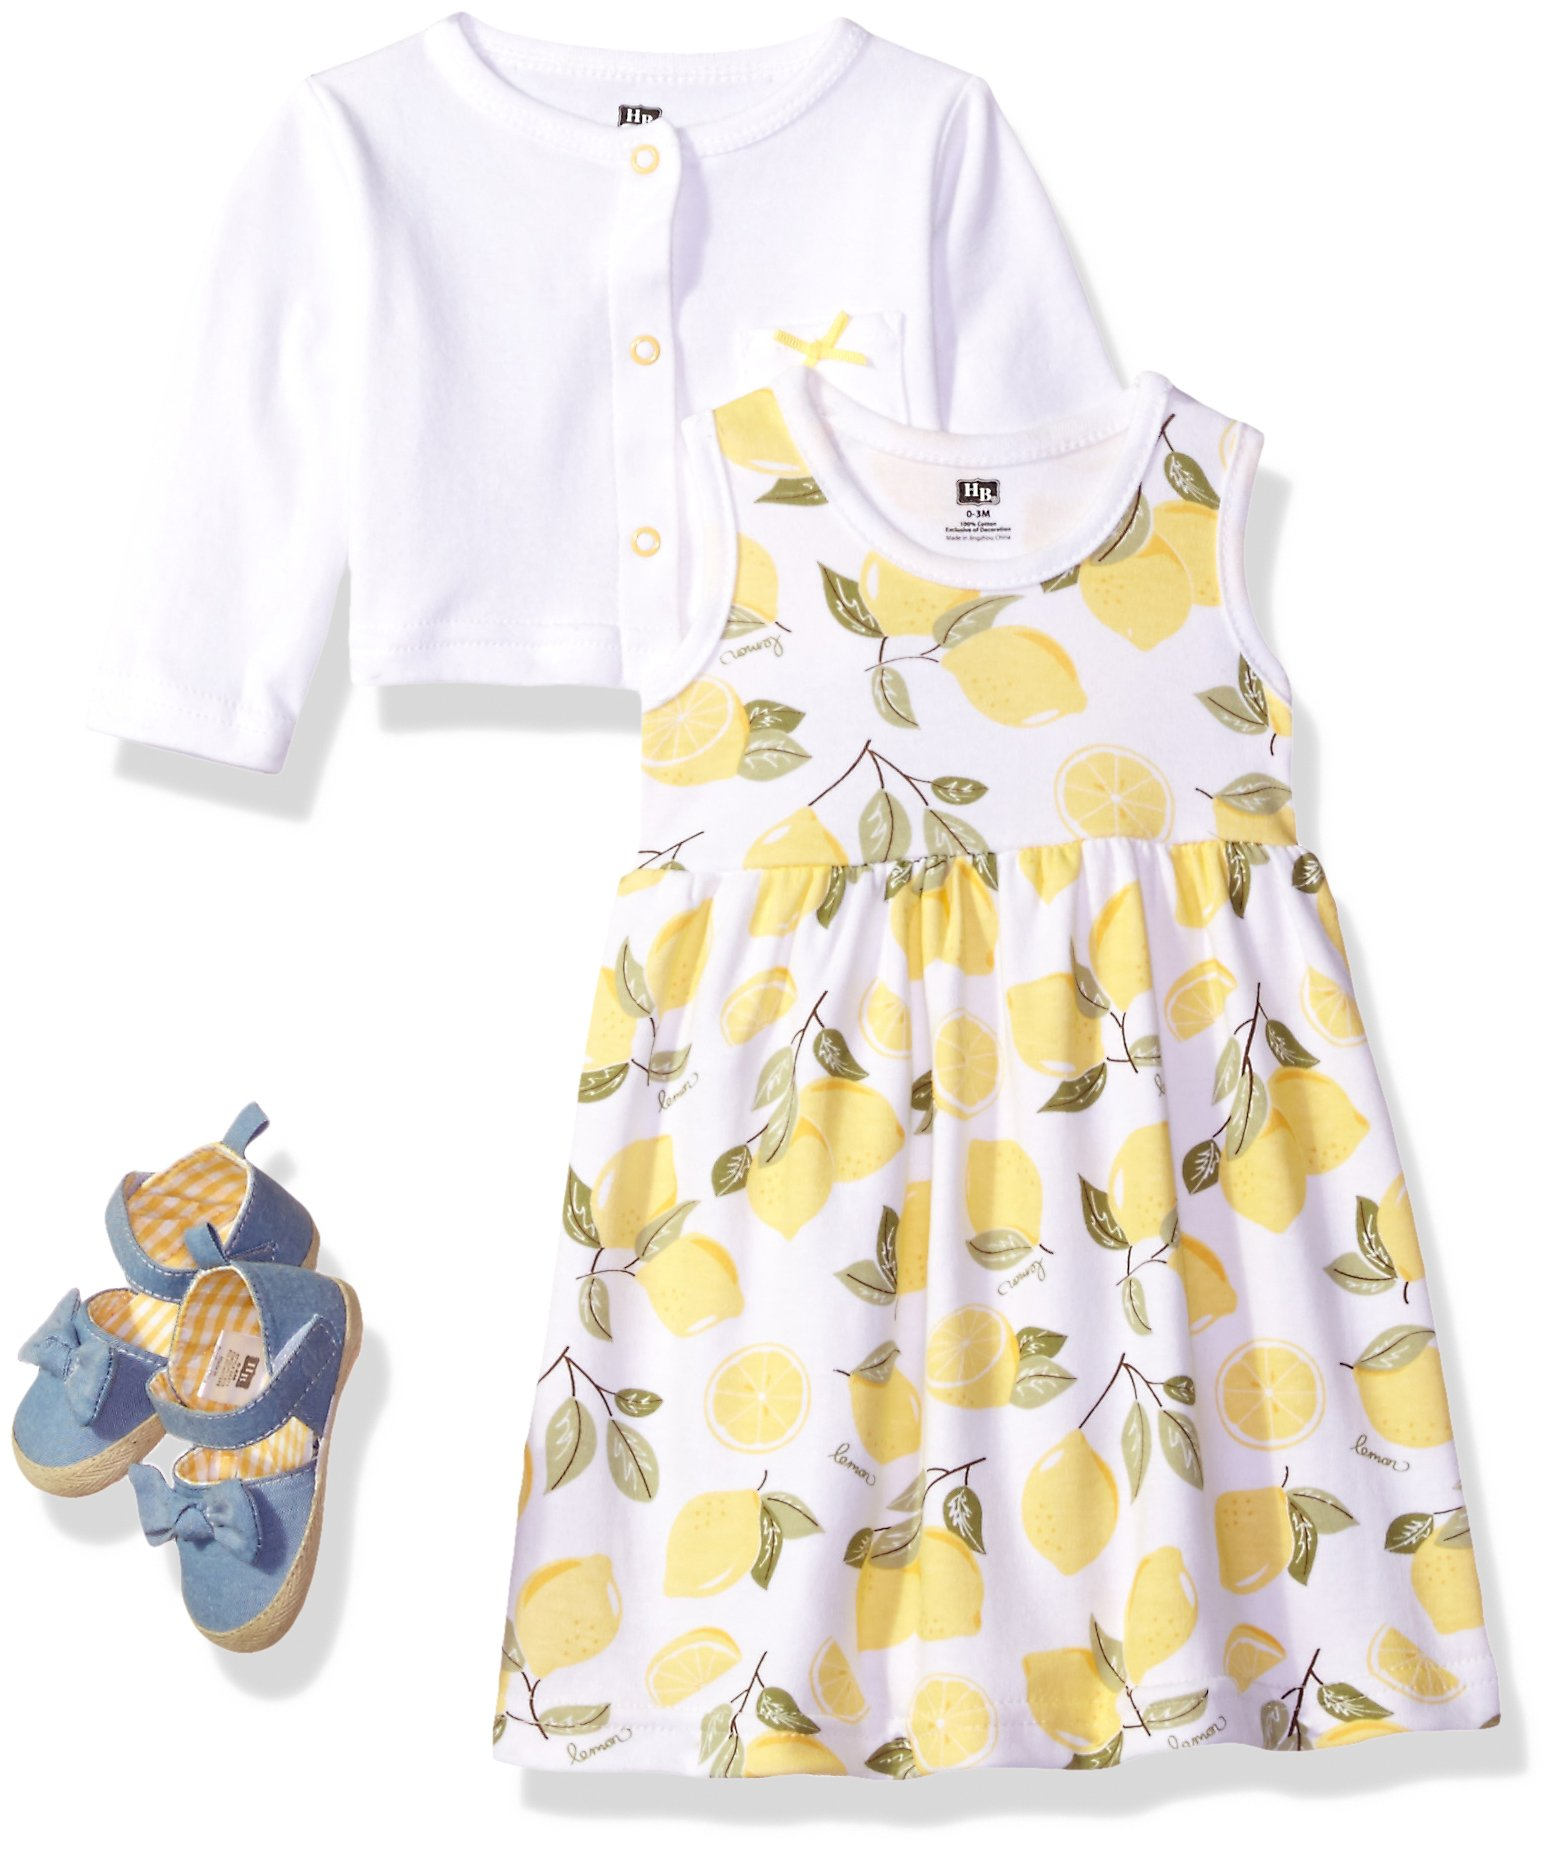 Hudson Baby Girls' 3 Piece Dress, Cardigan, Shoe Set, Lemons, 9-12 Months (12M)